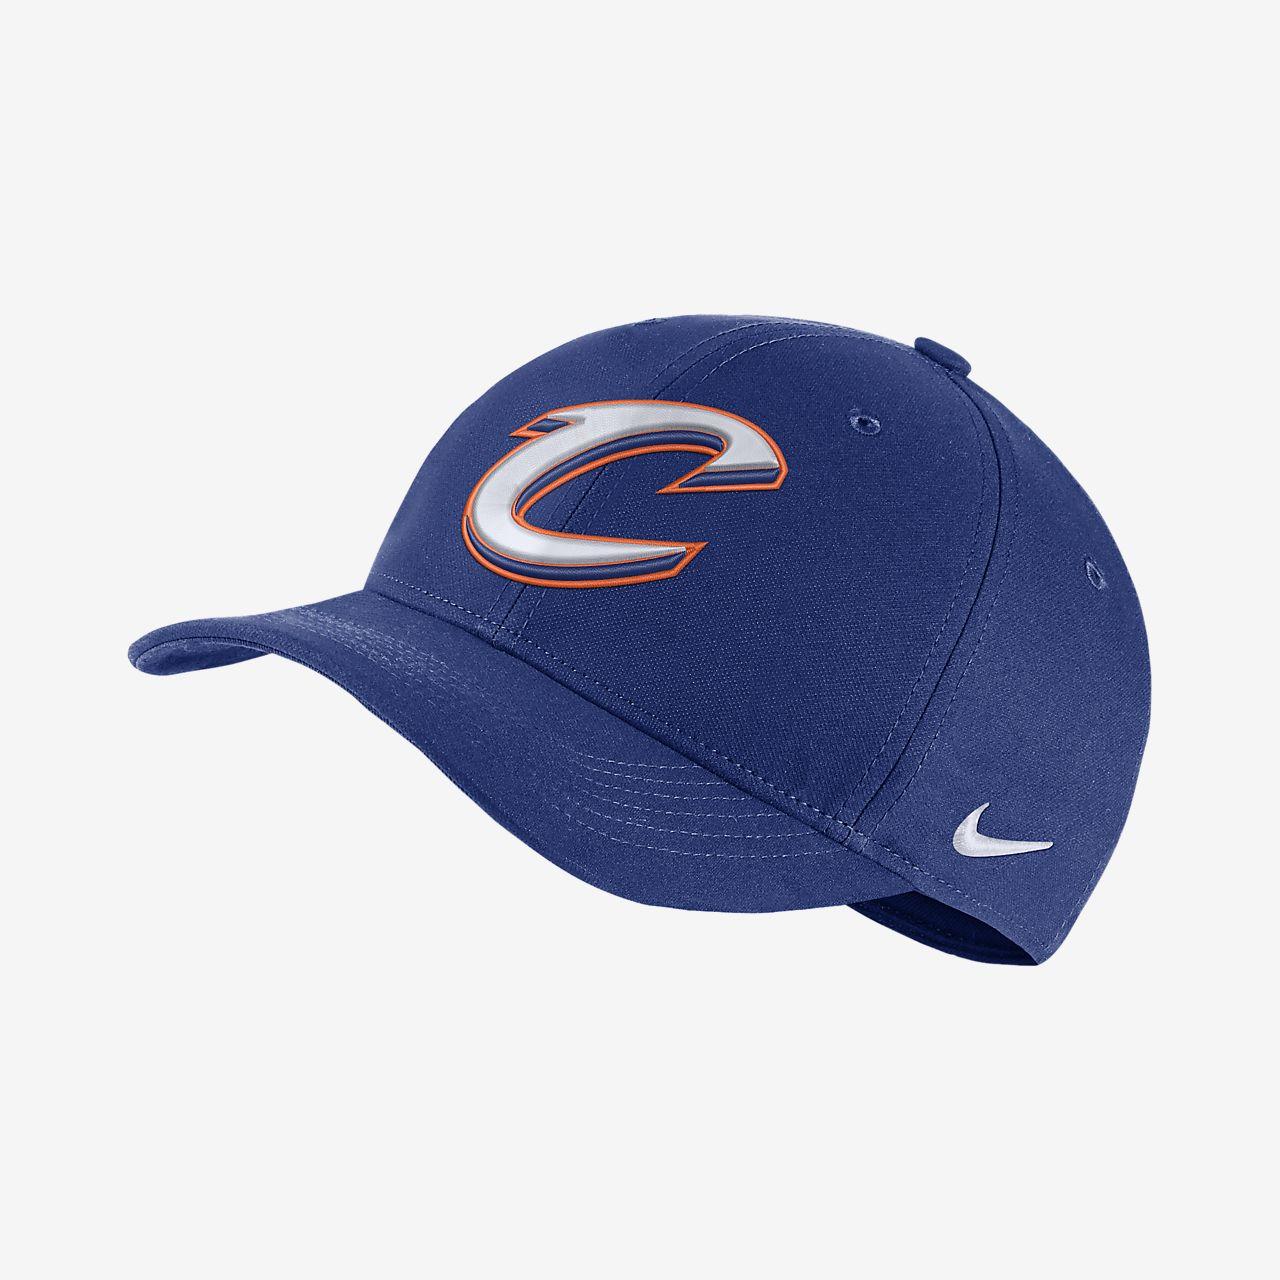 Cleveland Cavaliers City Edition Nike AeroBill Classic99 NBA-Cap